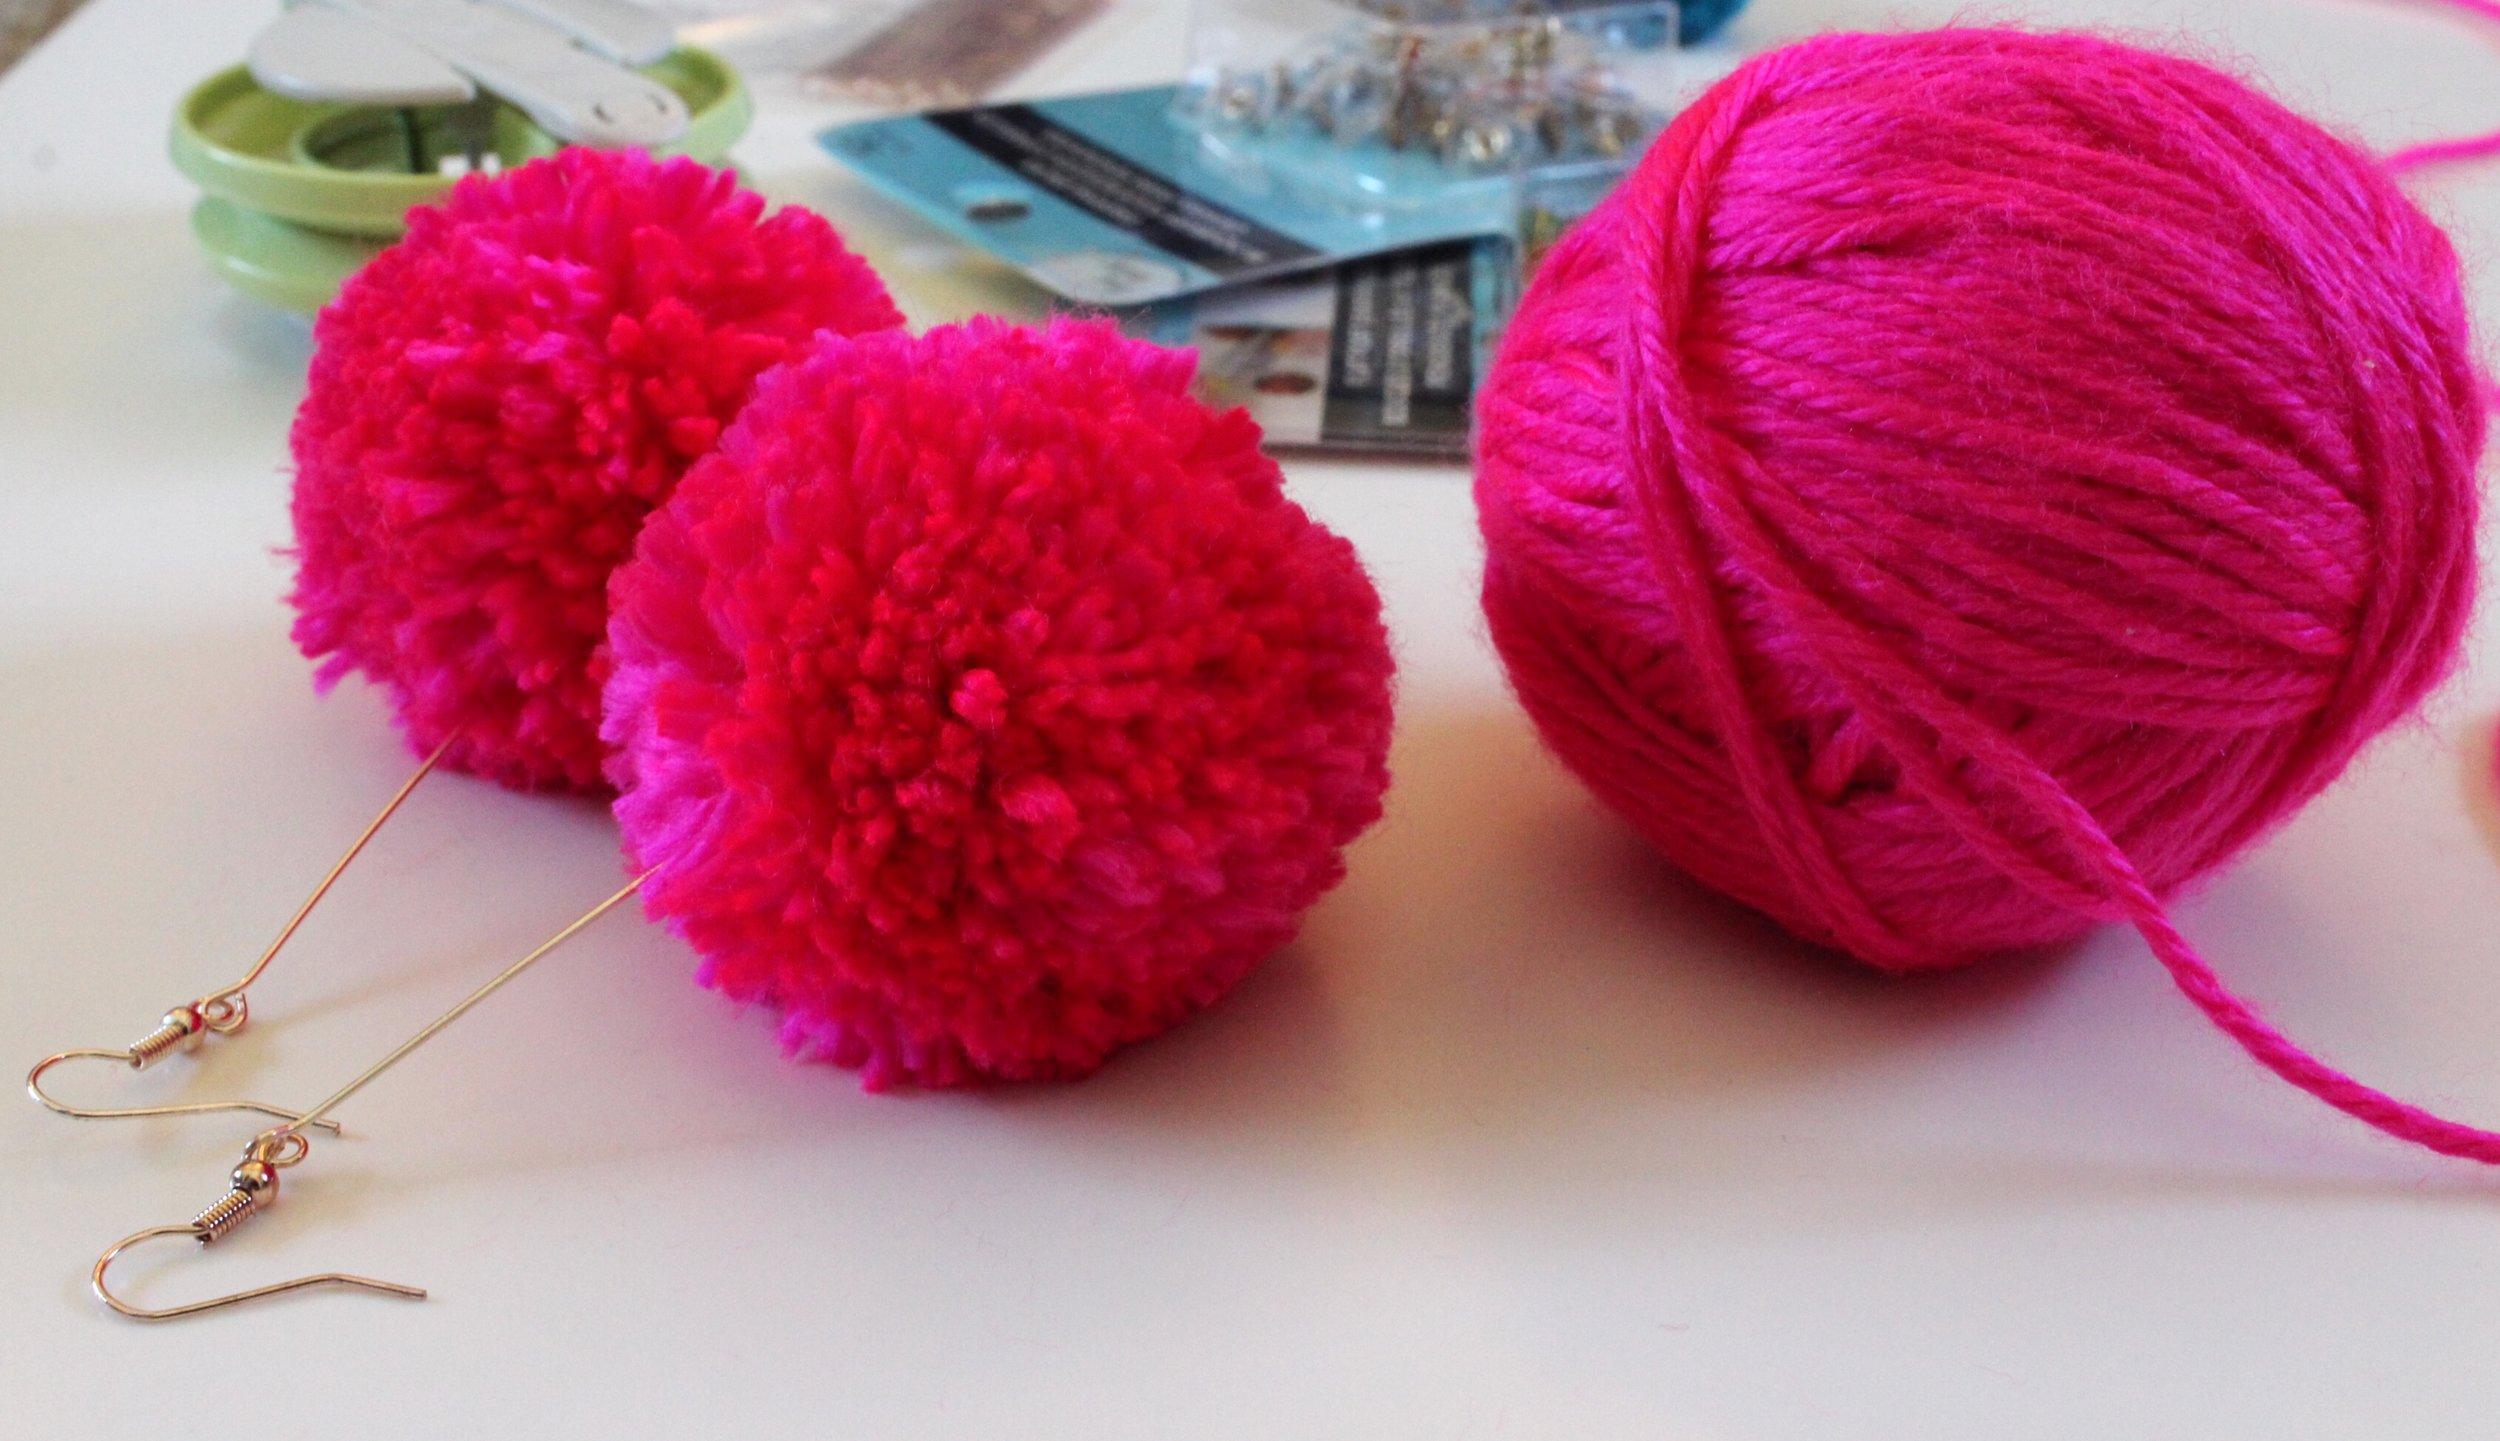 Hot Pink Pom Pom Dangle Earrings and Ball of Yarn.